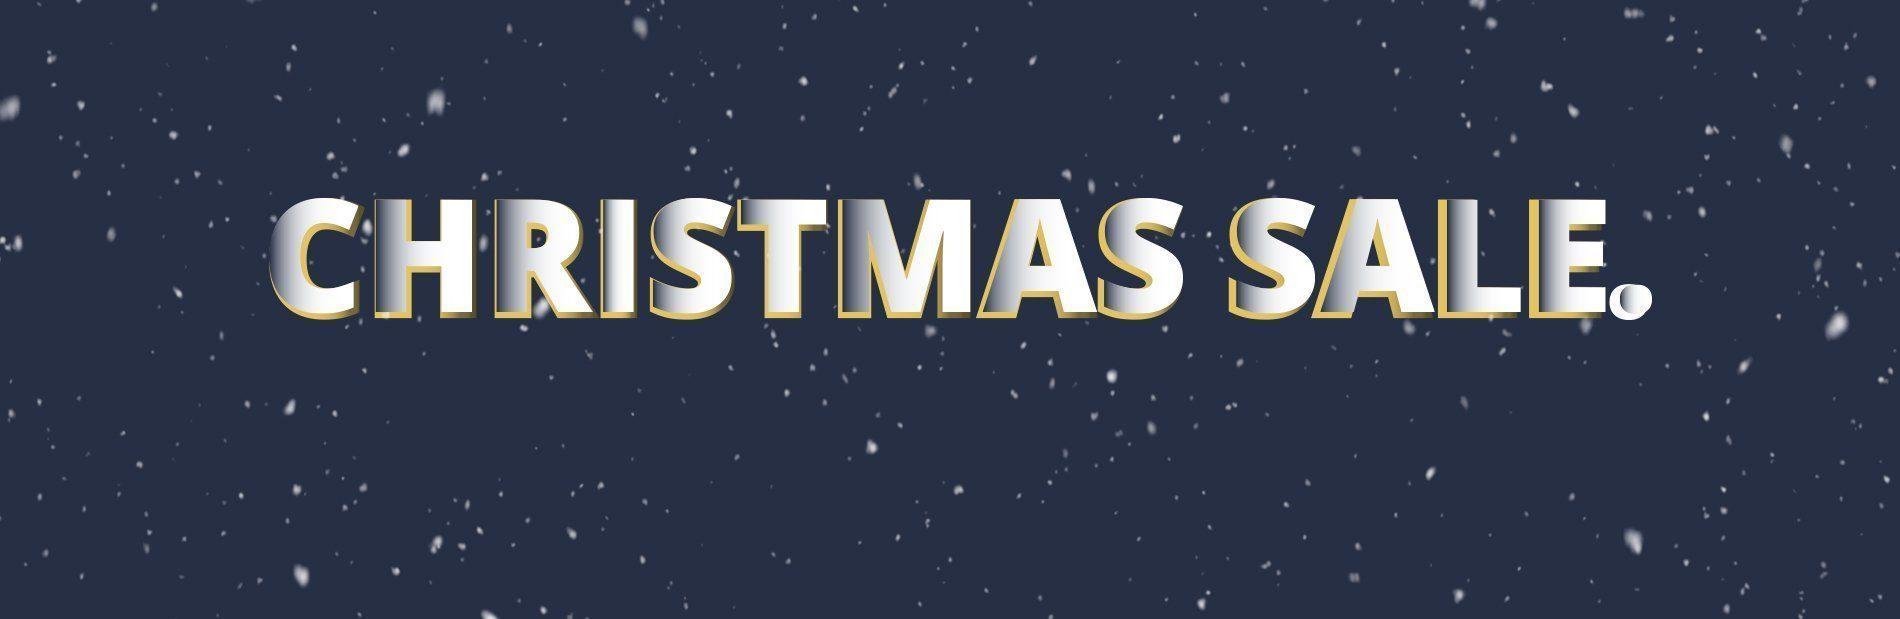 christmas sale banner blue